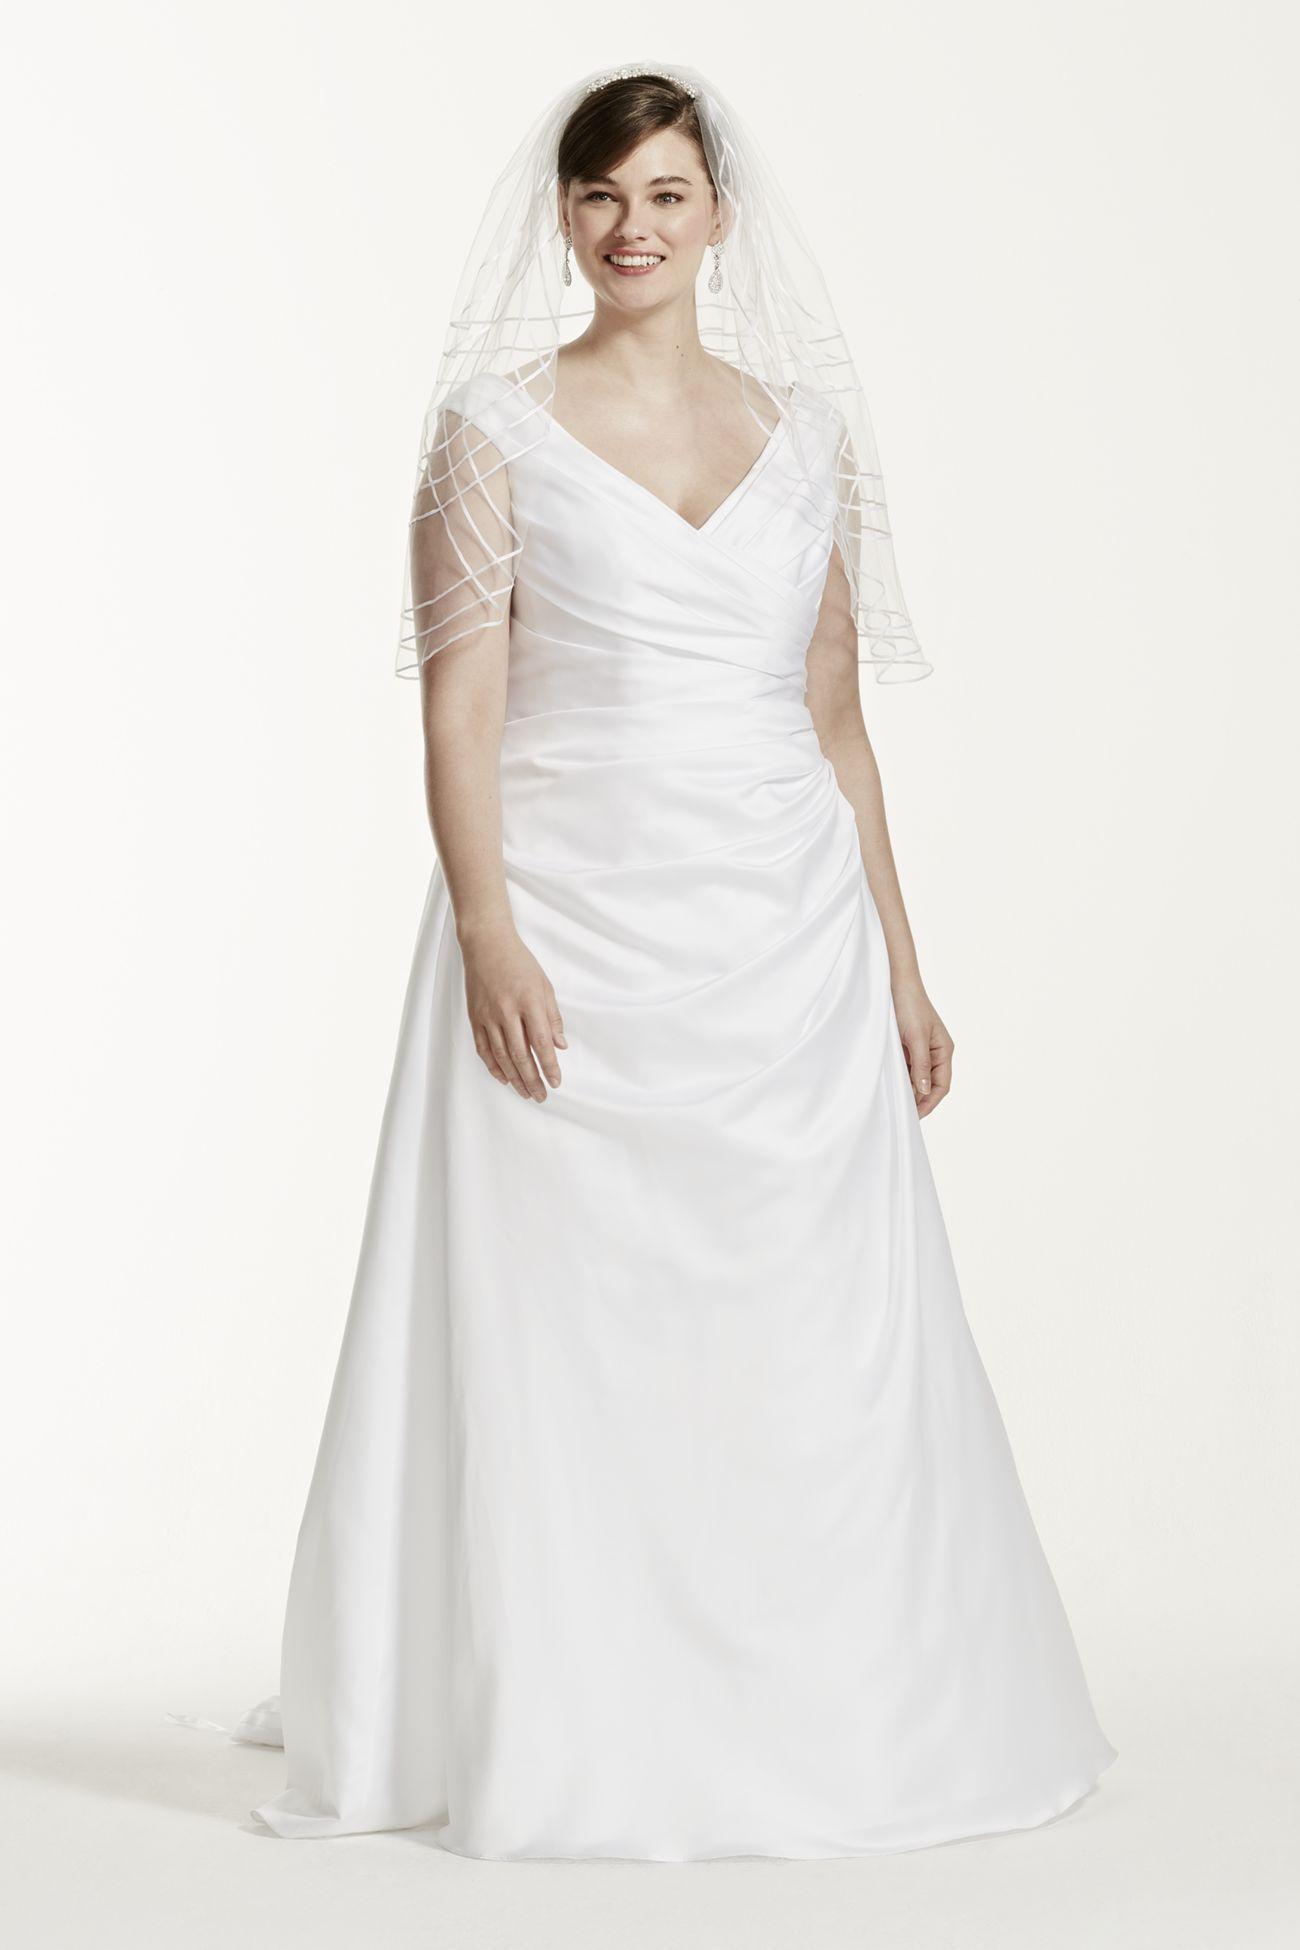 Rent wedding dress davids bridal  T  Wedding  Pinterest  Wedding bells Wedding dress and